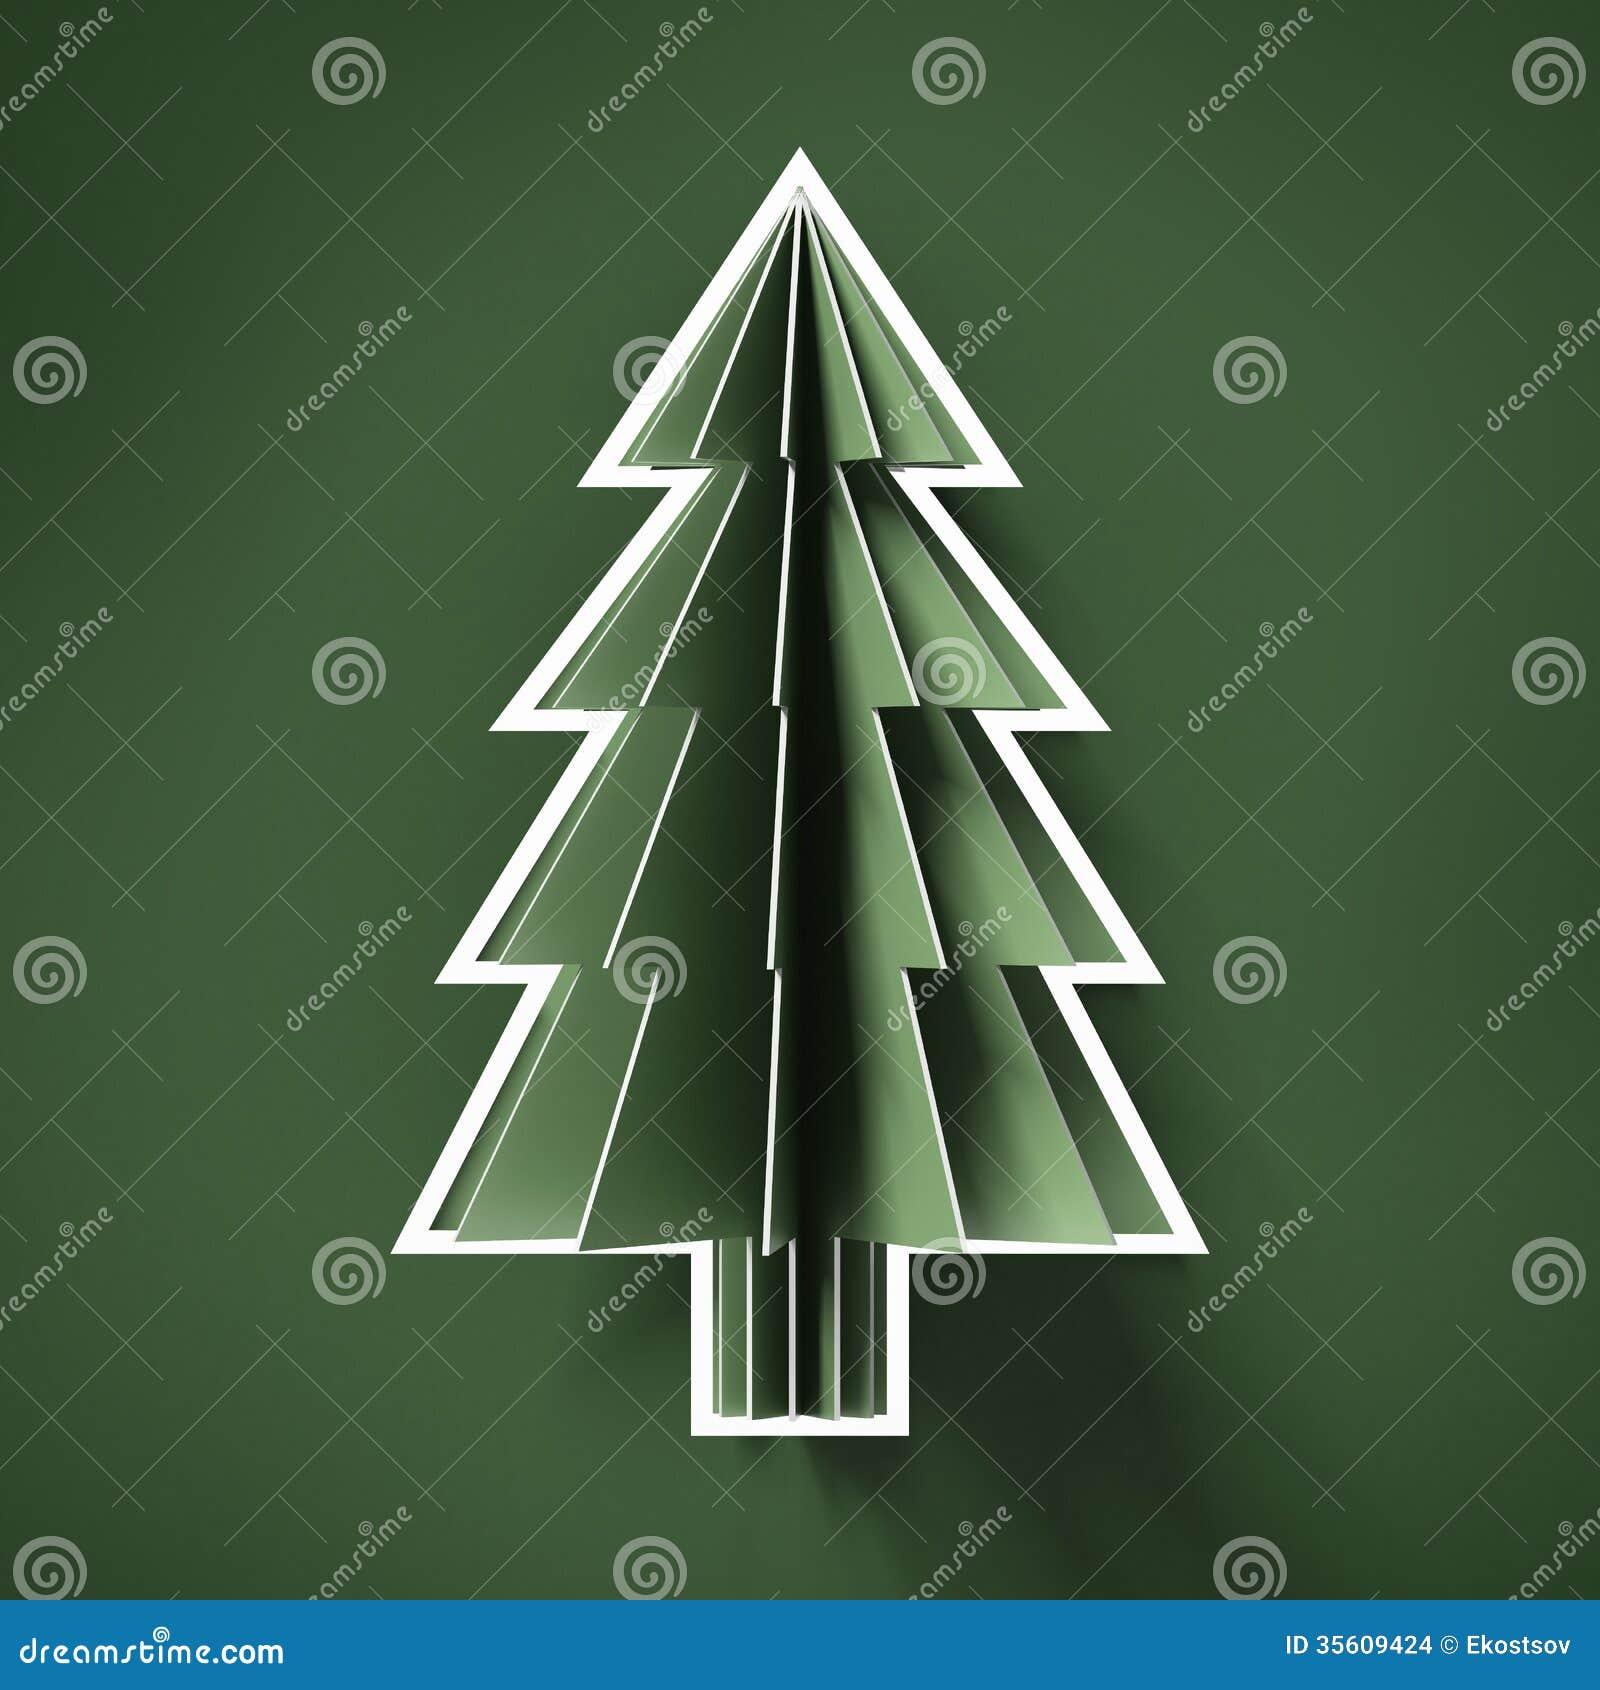 Green Cut Paper Christmas Tree Stock Illustration - Illustration of garland, hobby: 35609424